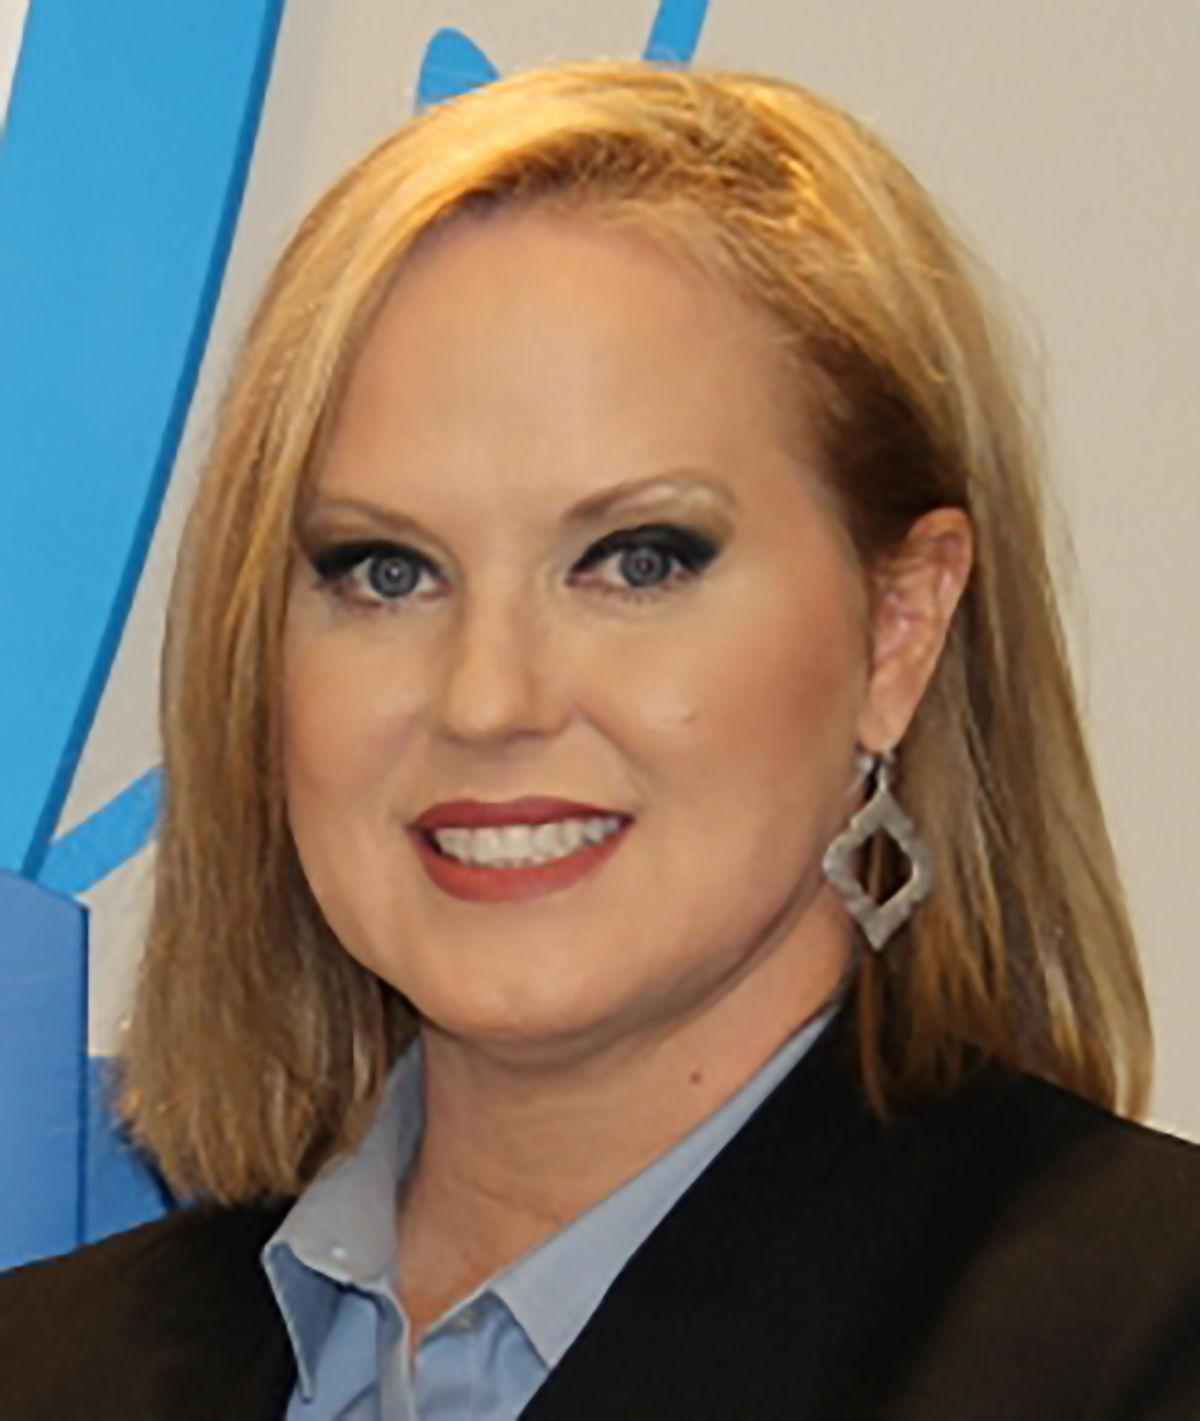 Marshall County Schools Superintendent Cindy Wigley